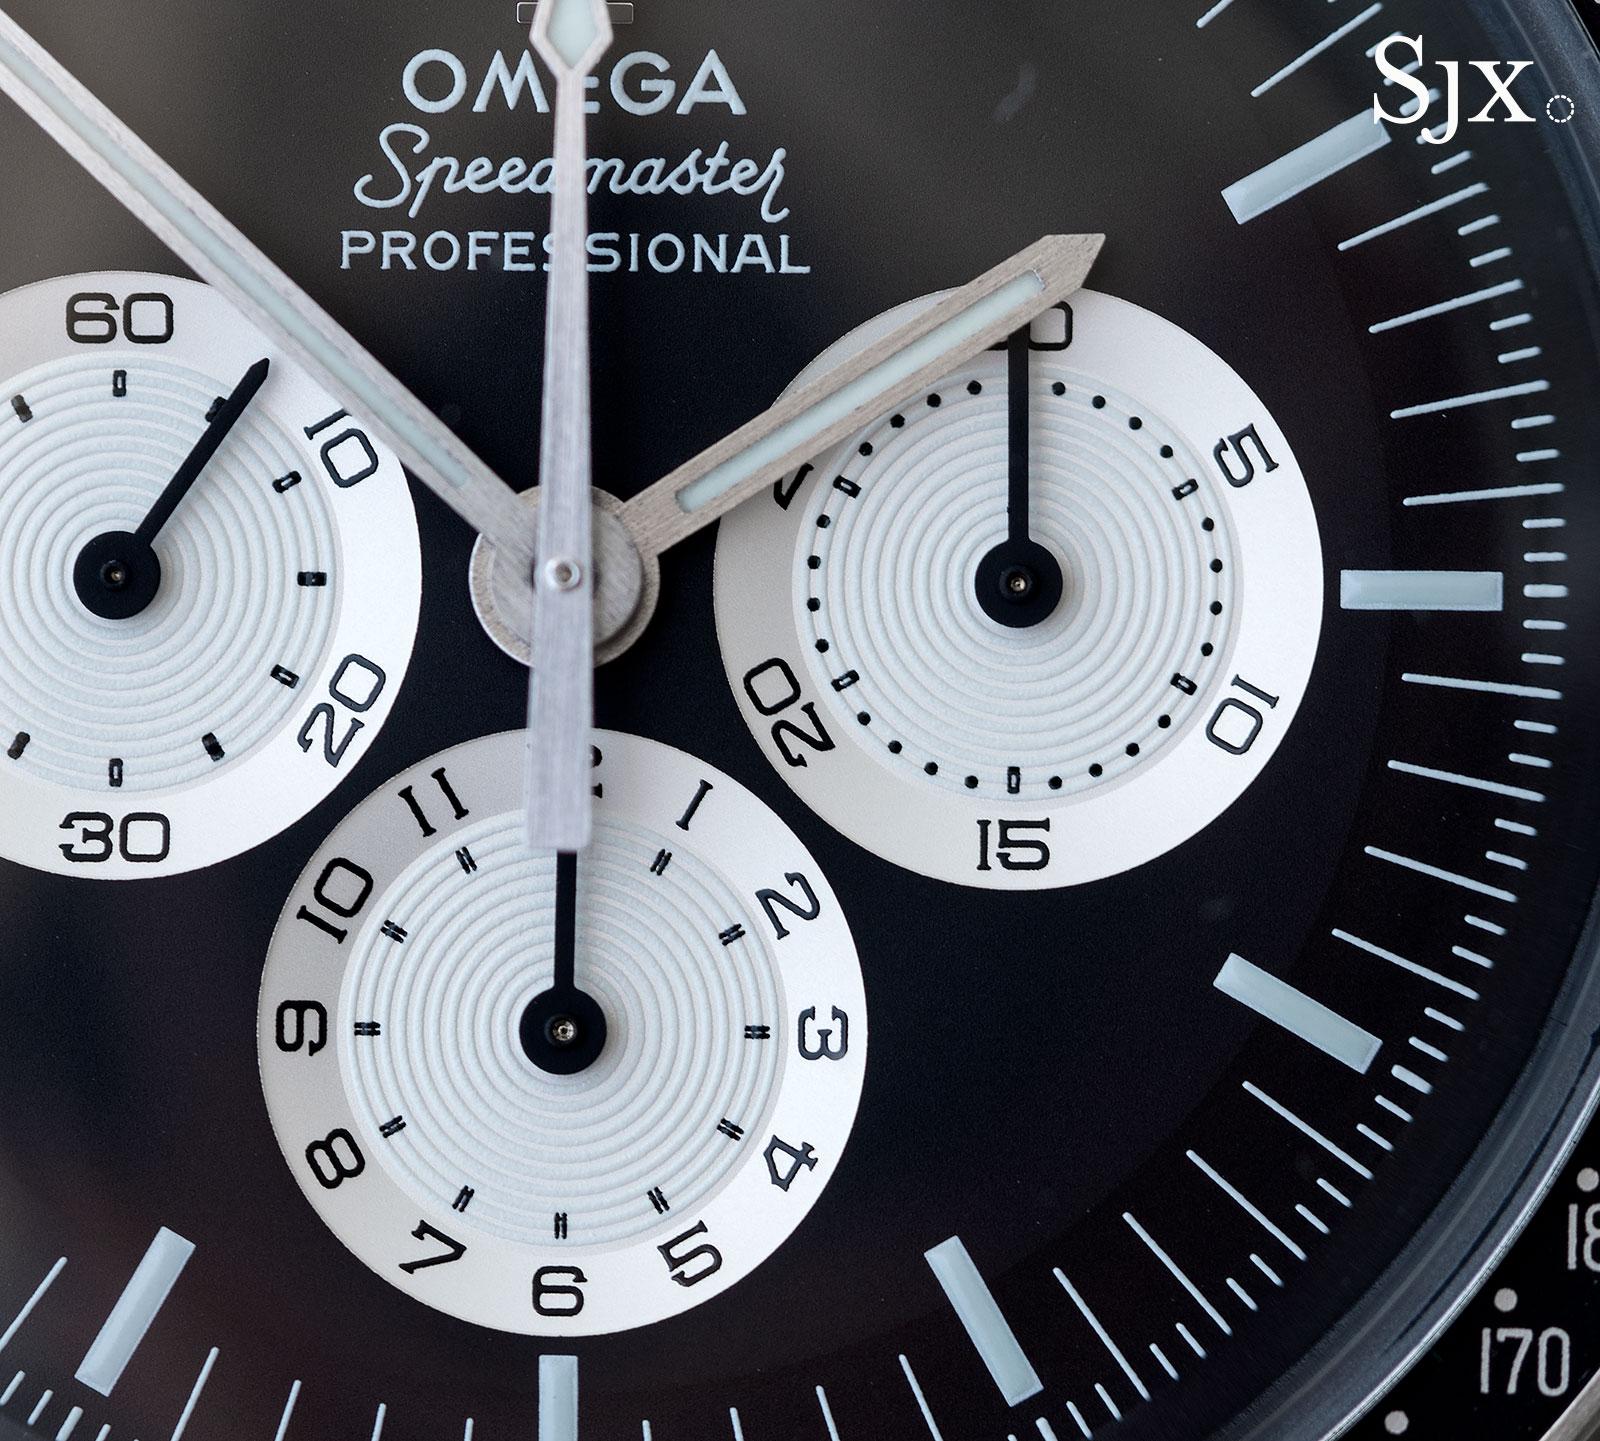 Omega Speedmaster Speedy Tuesday review 3